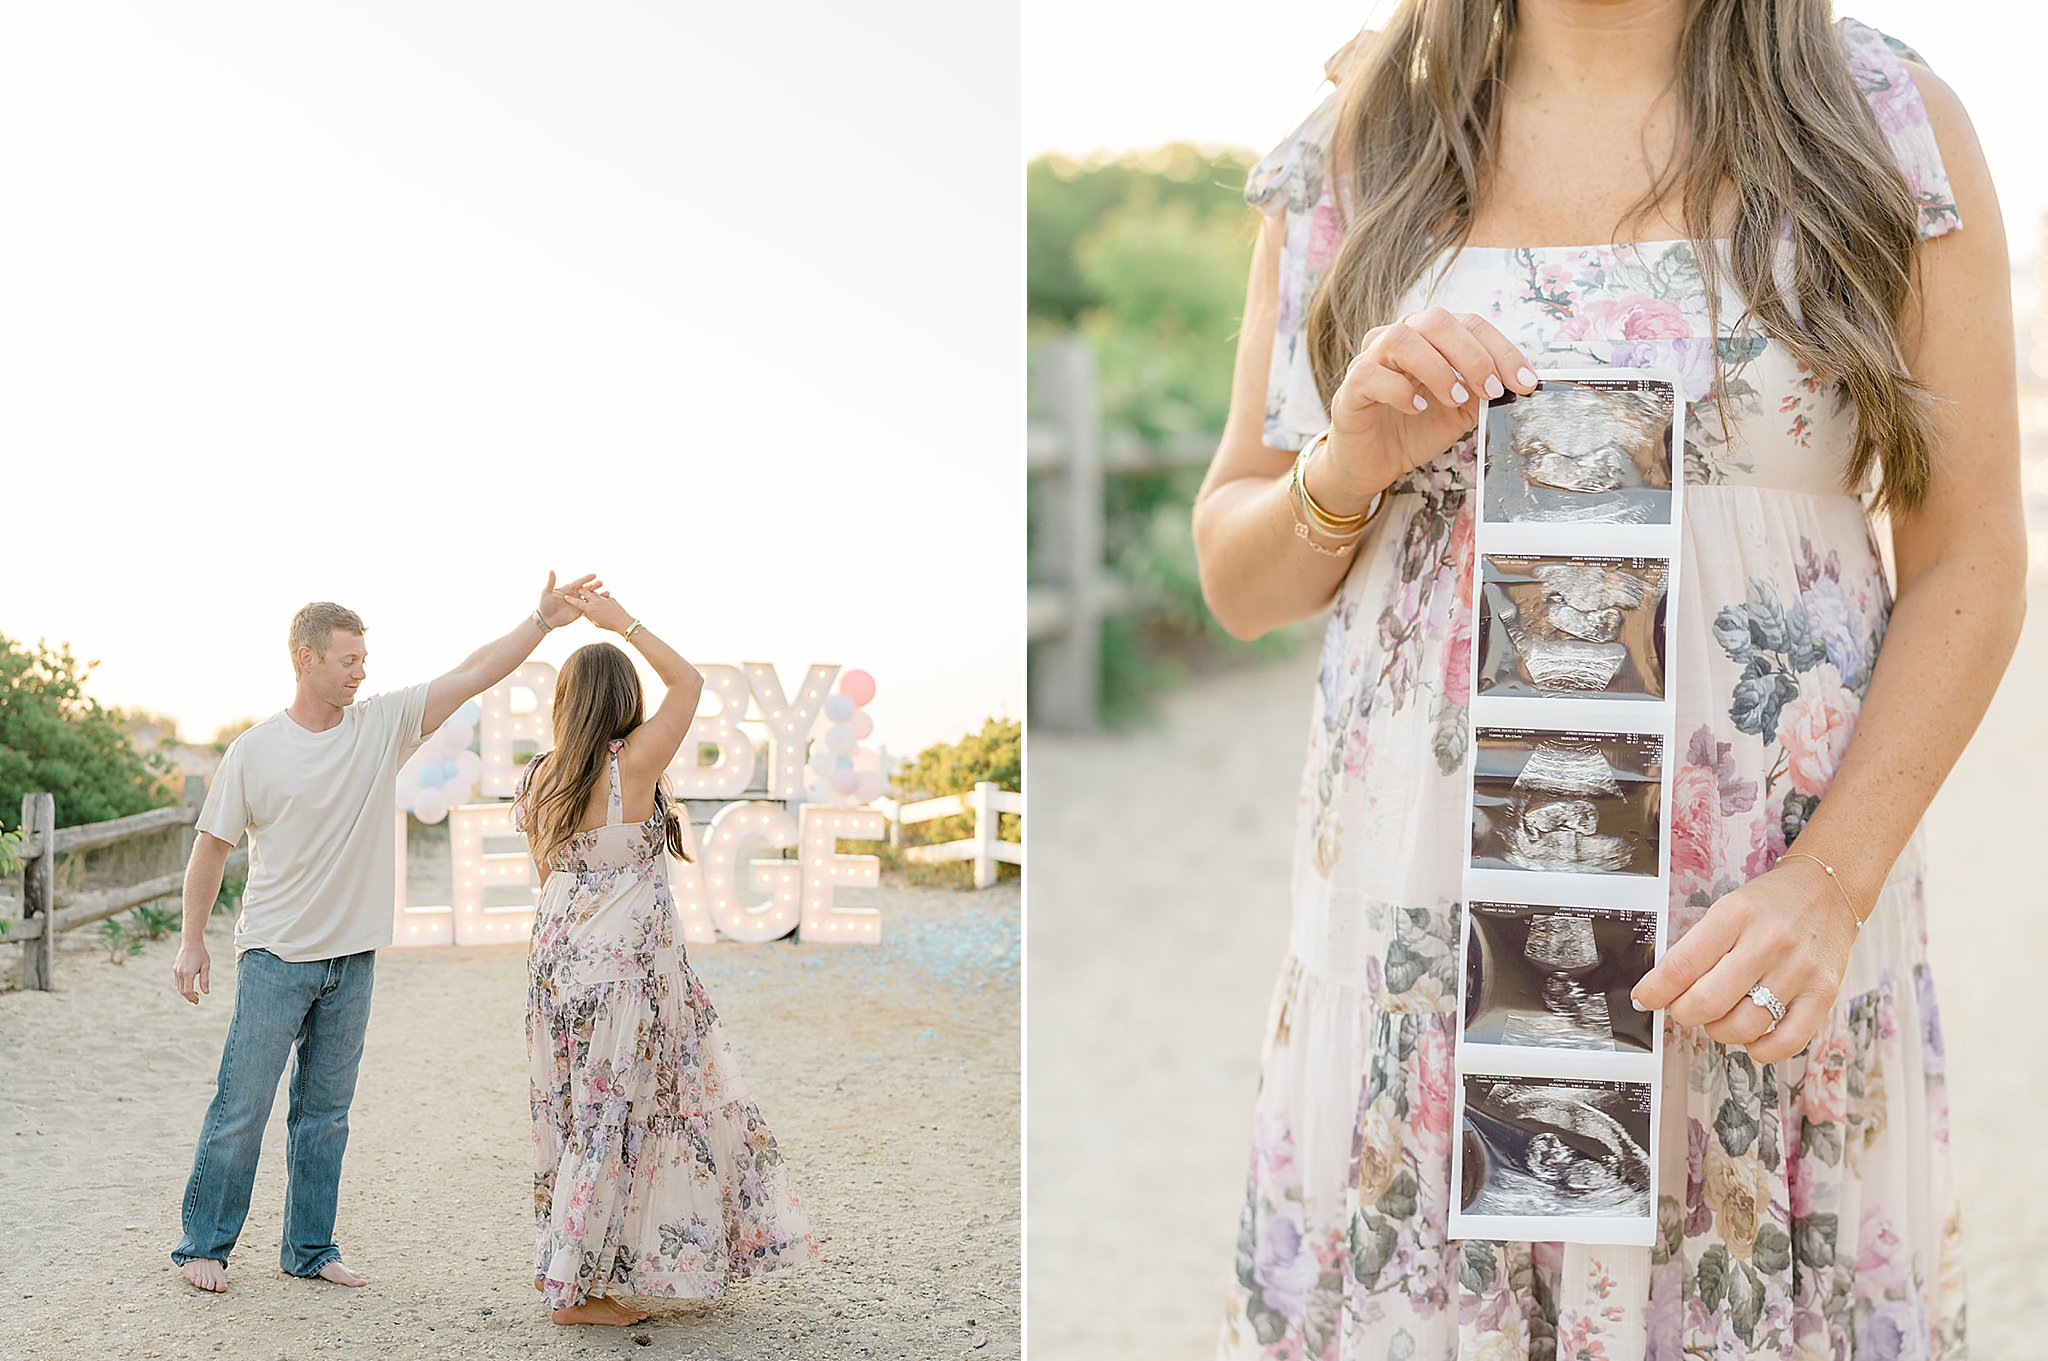 Ocean City NJ Gender Reveal Pregnancy Photography by Magdalena Studios 0013 1